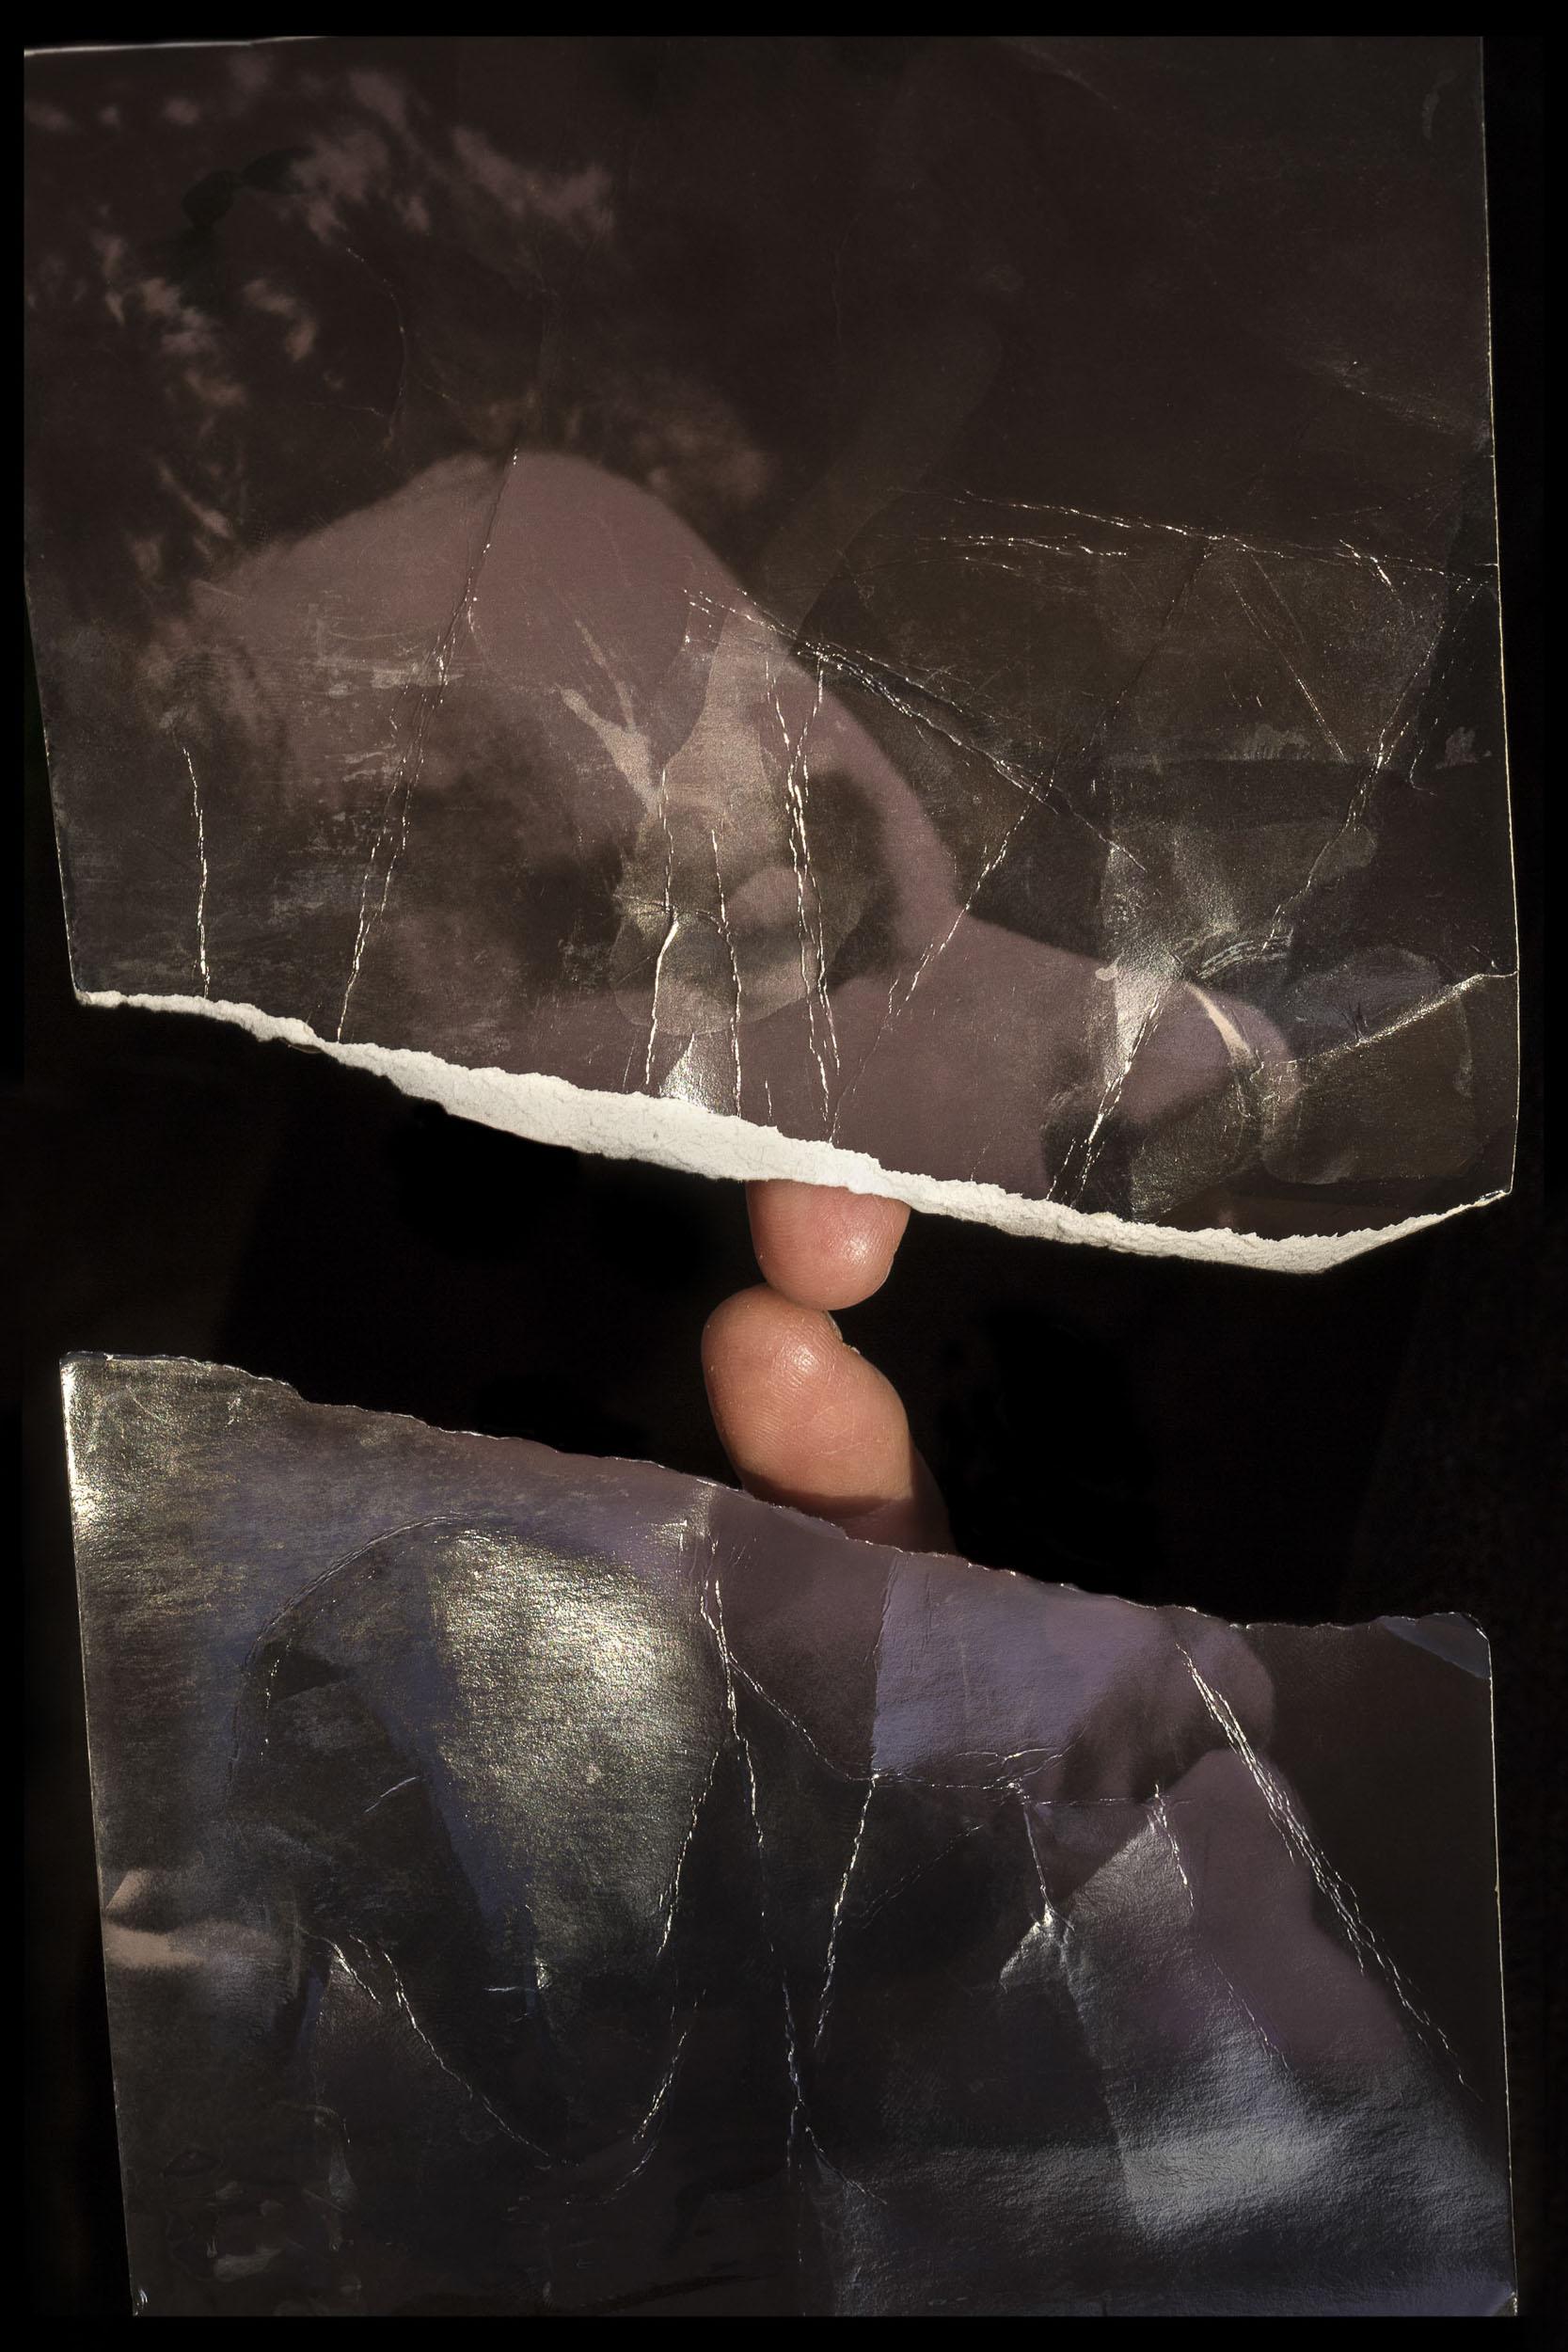 The Cut (May I?), 33.4*22 inch, Archival Inkjet Print